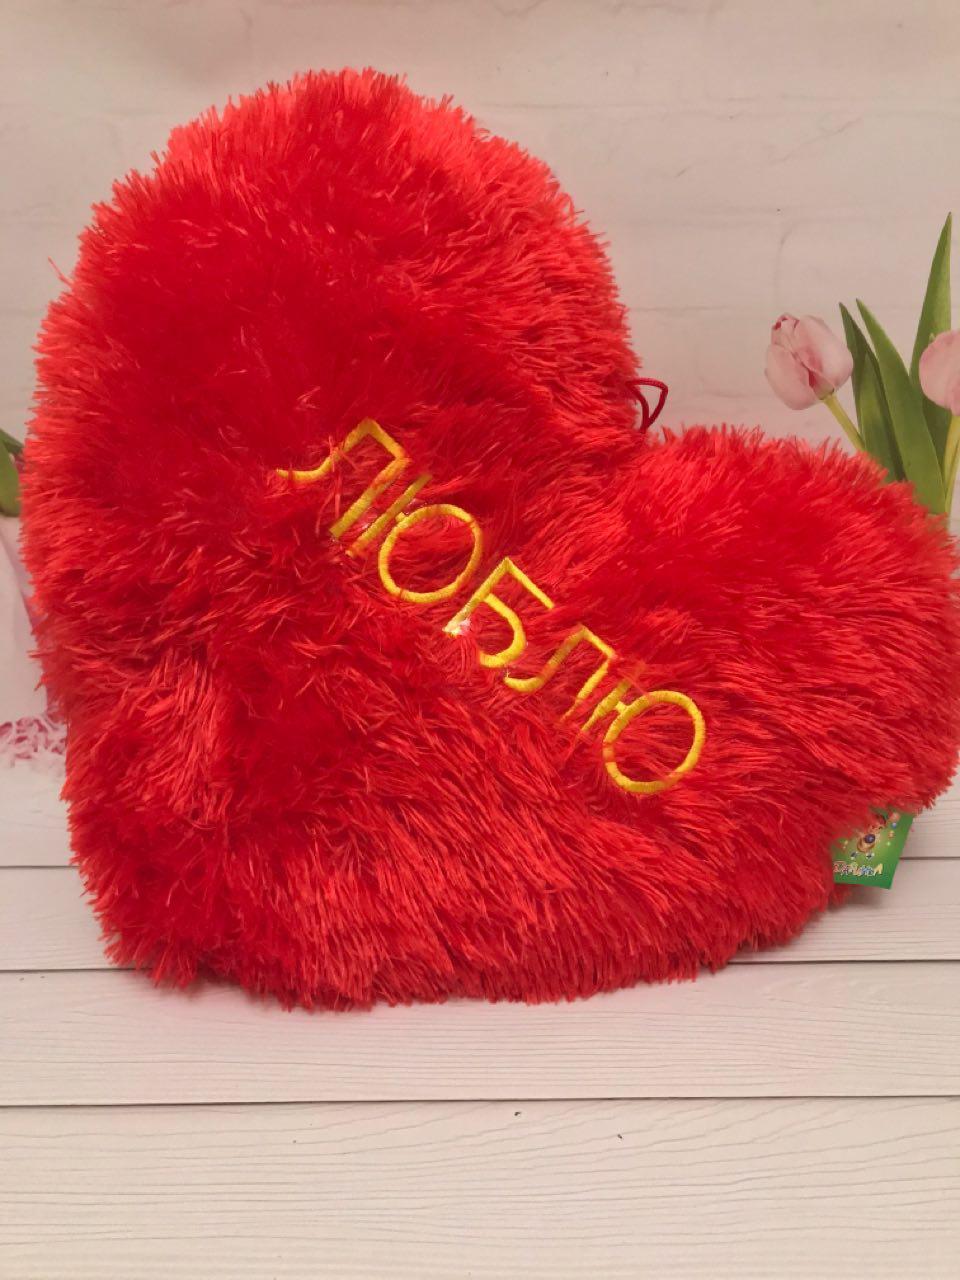 Мягкая игрушка подушка Сердце 45х35 см красное